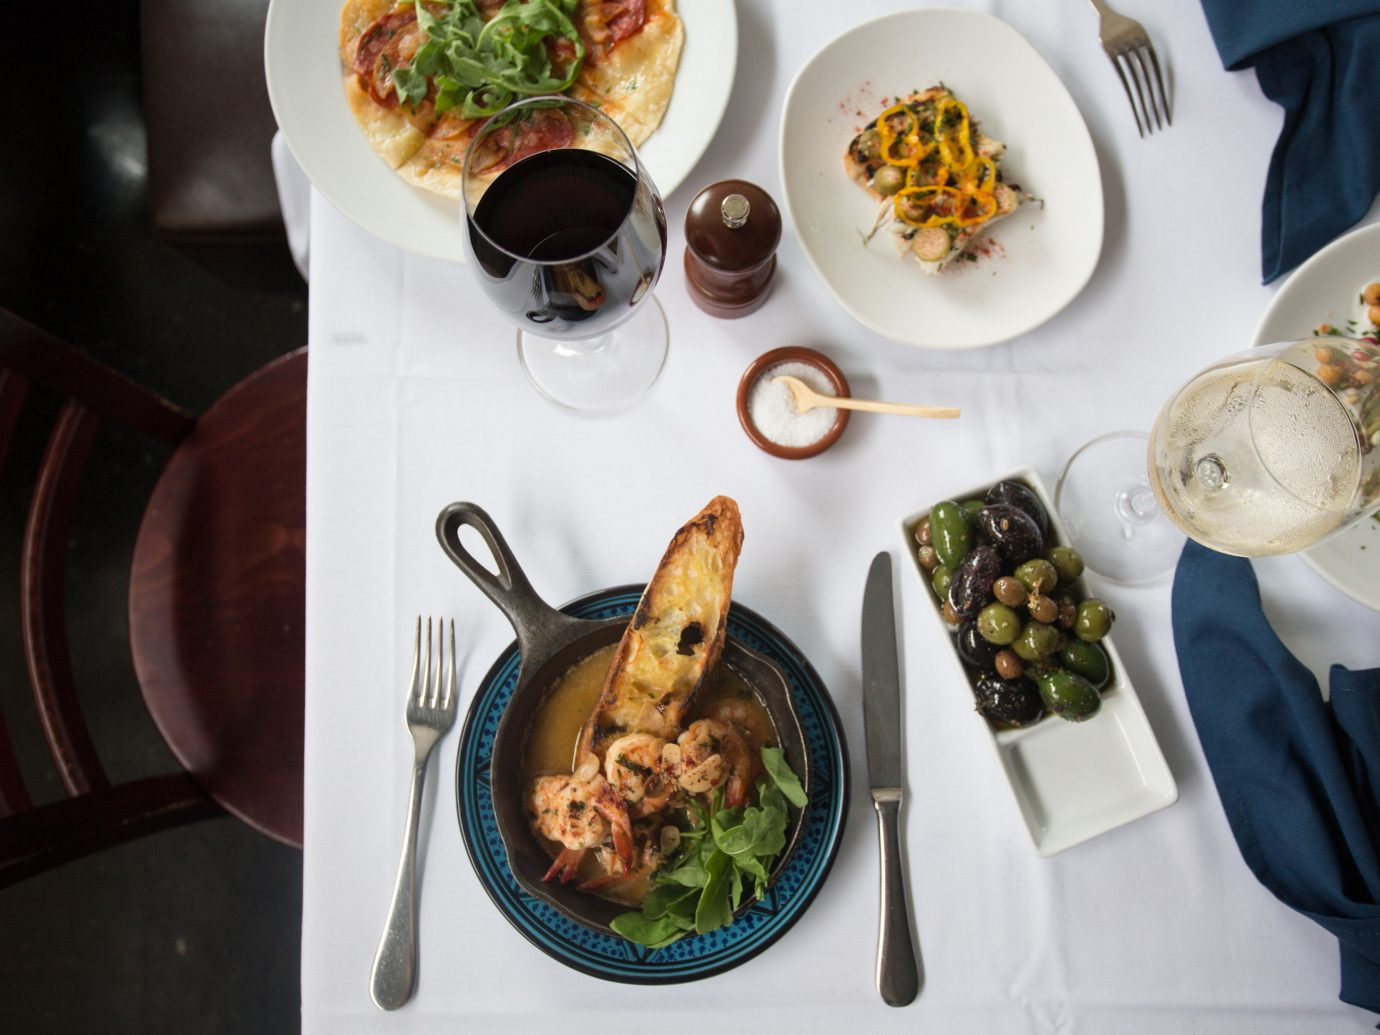 Trip Ideas plate food meal dish restaurant lunch brunch dinner sense cuisine several